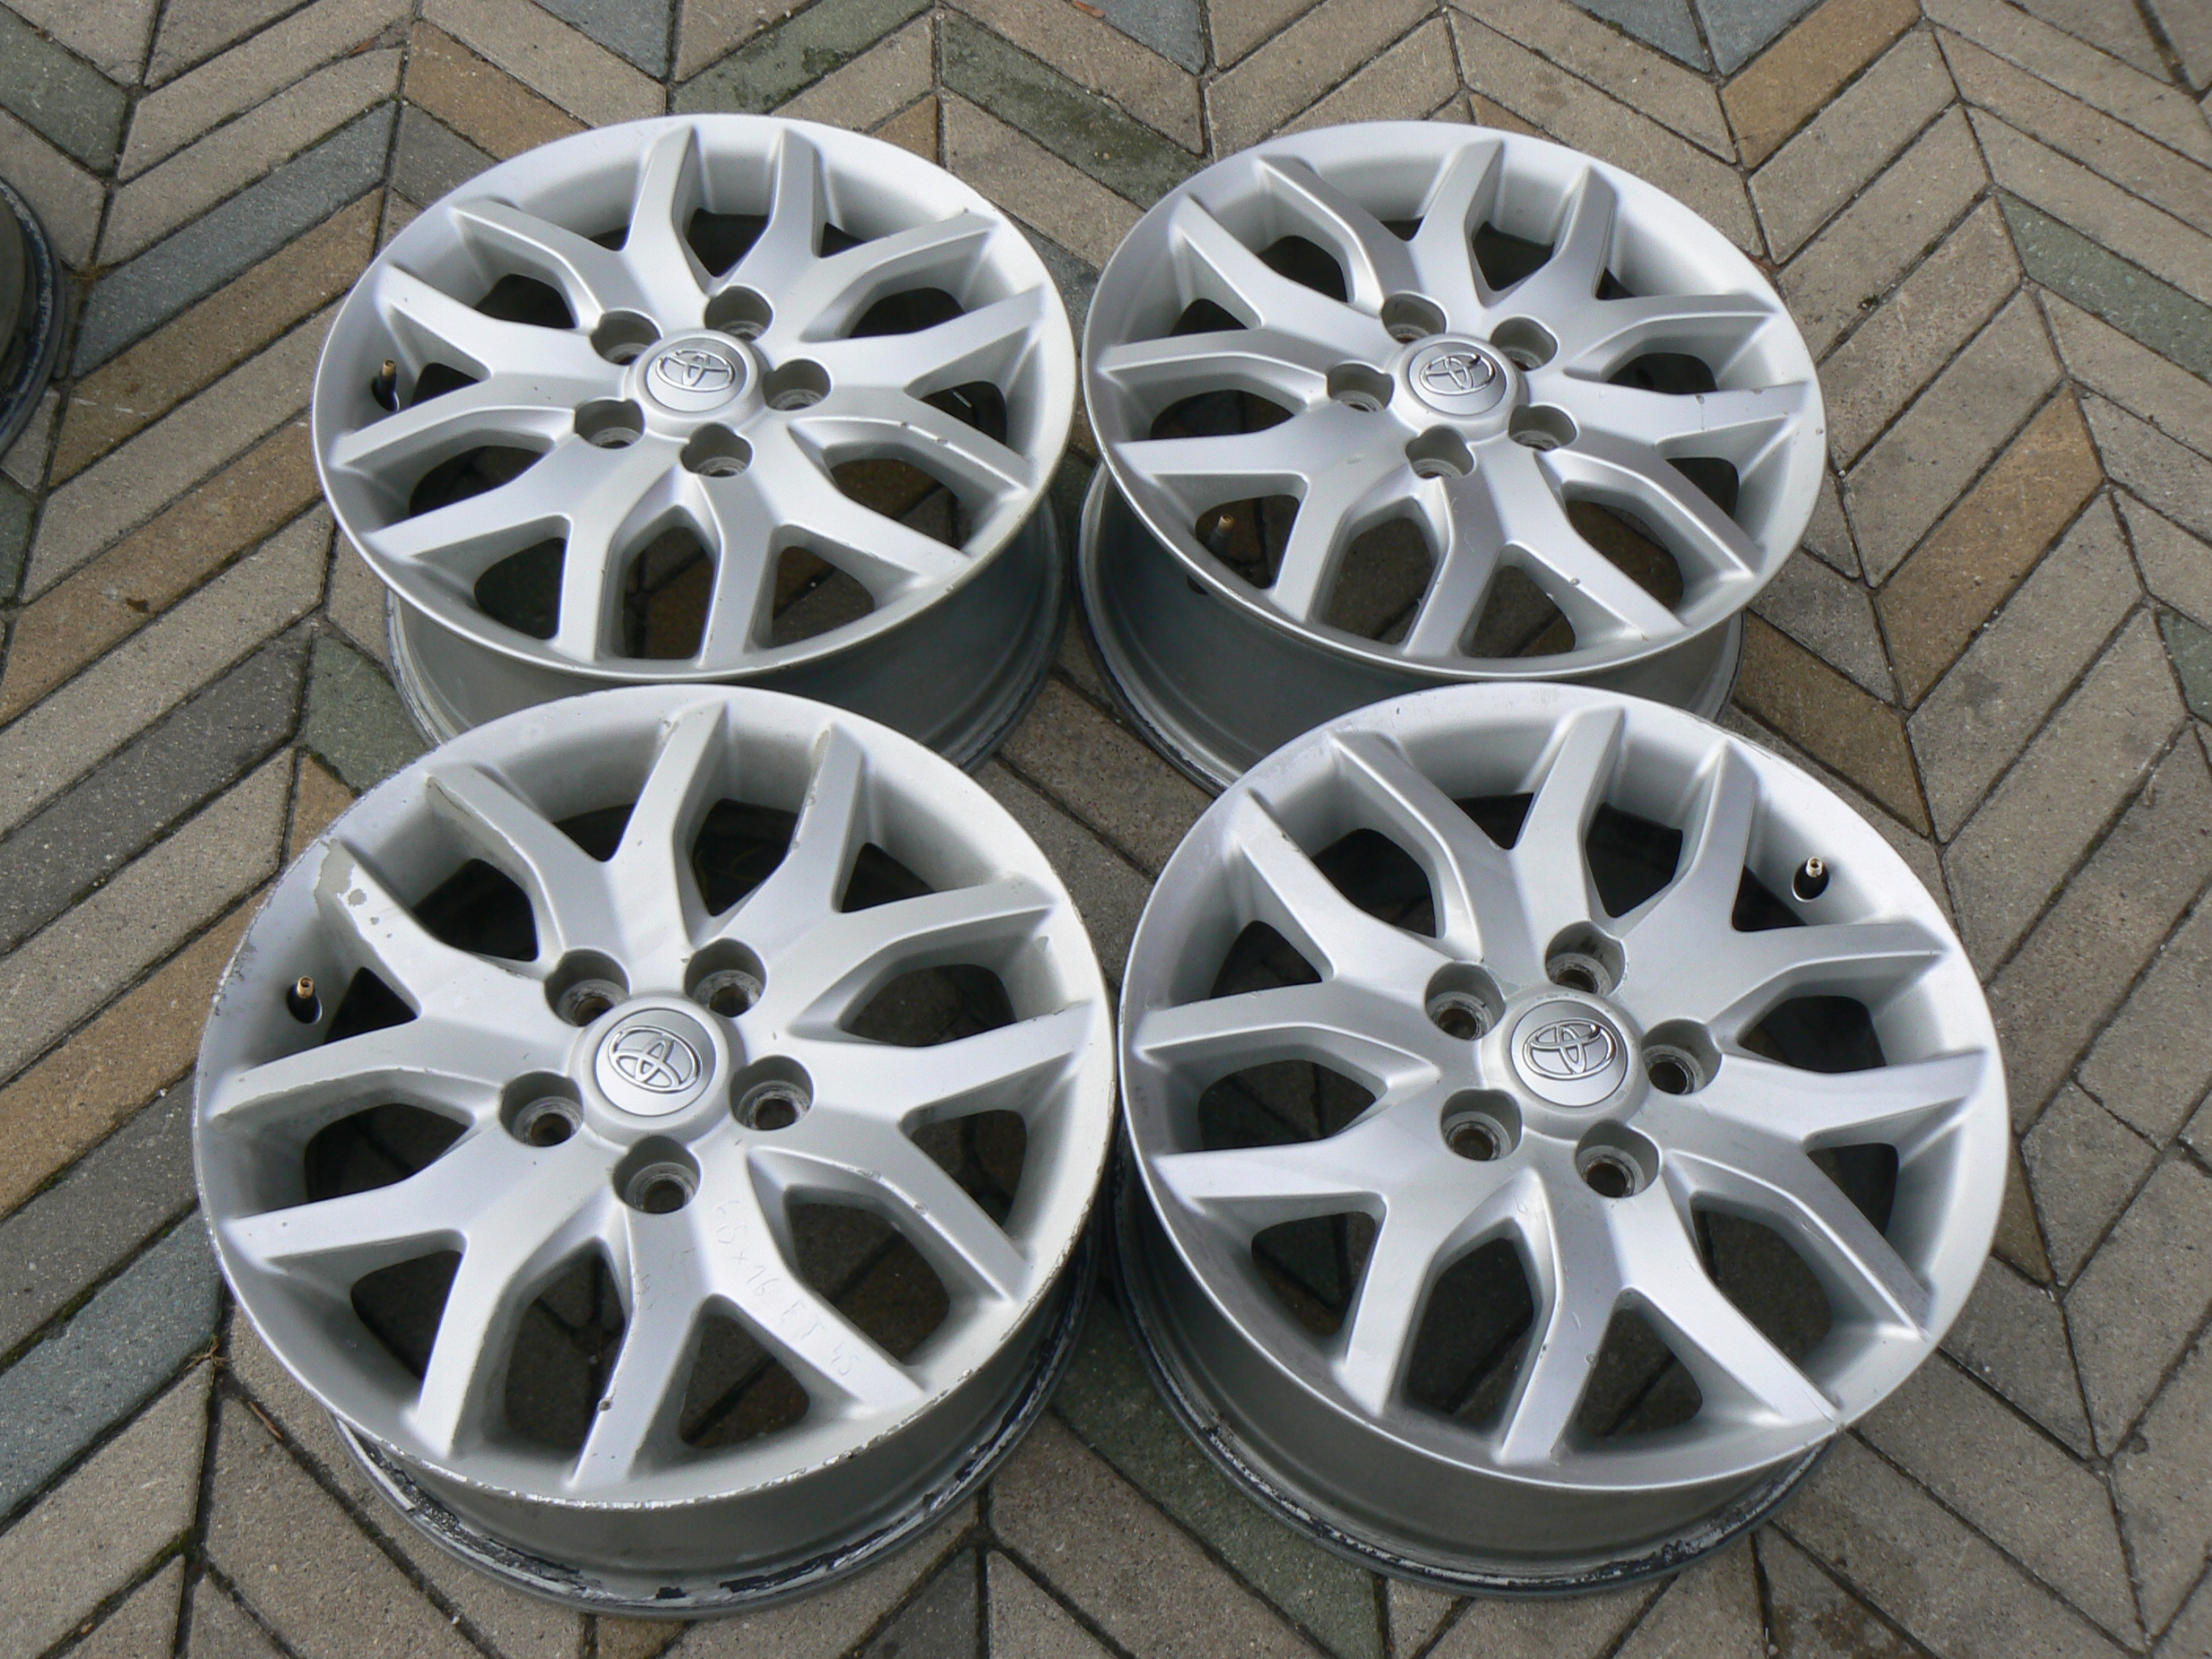 Toyota Auris Felgi Aluminiowe 16 4szt 7582214447 Oficjalne